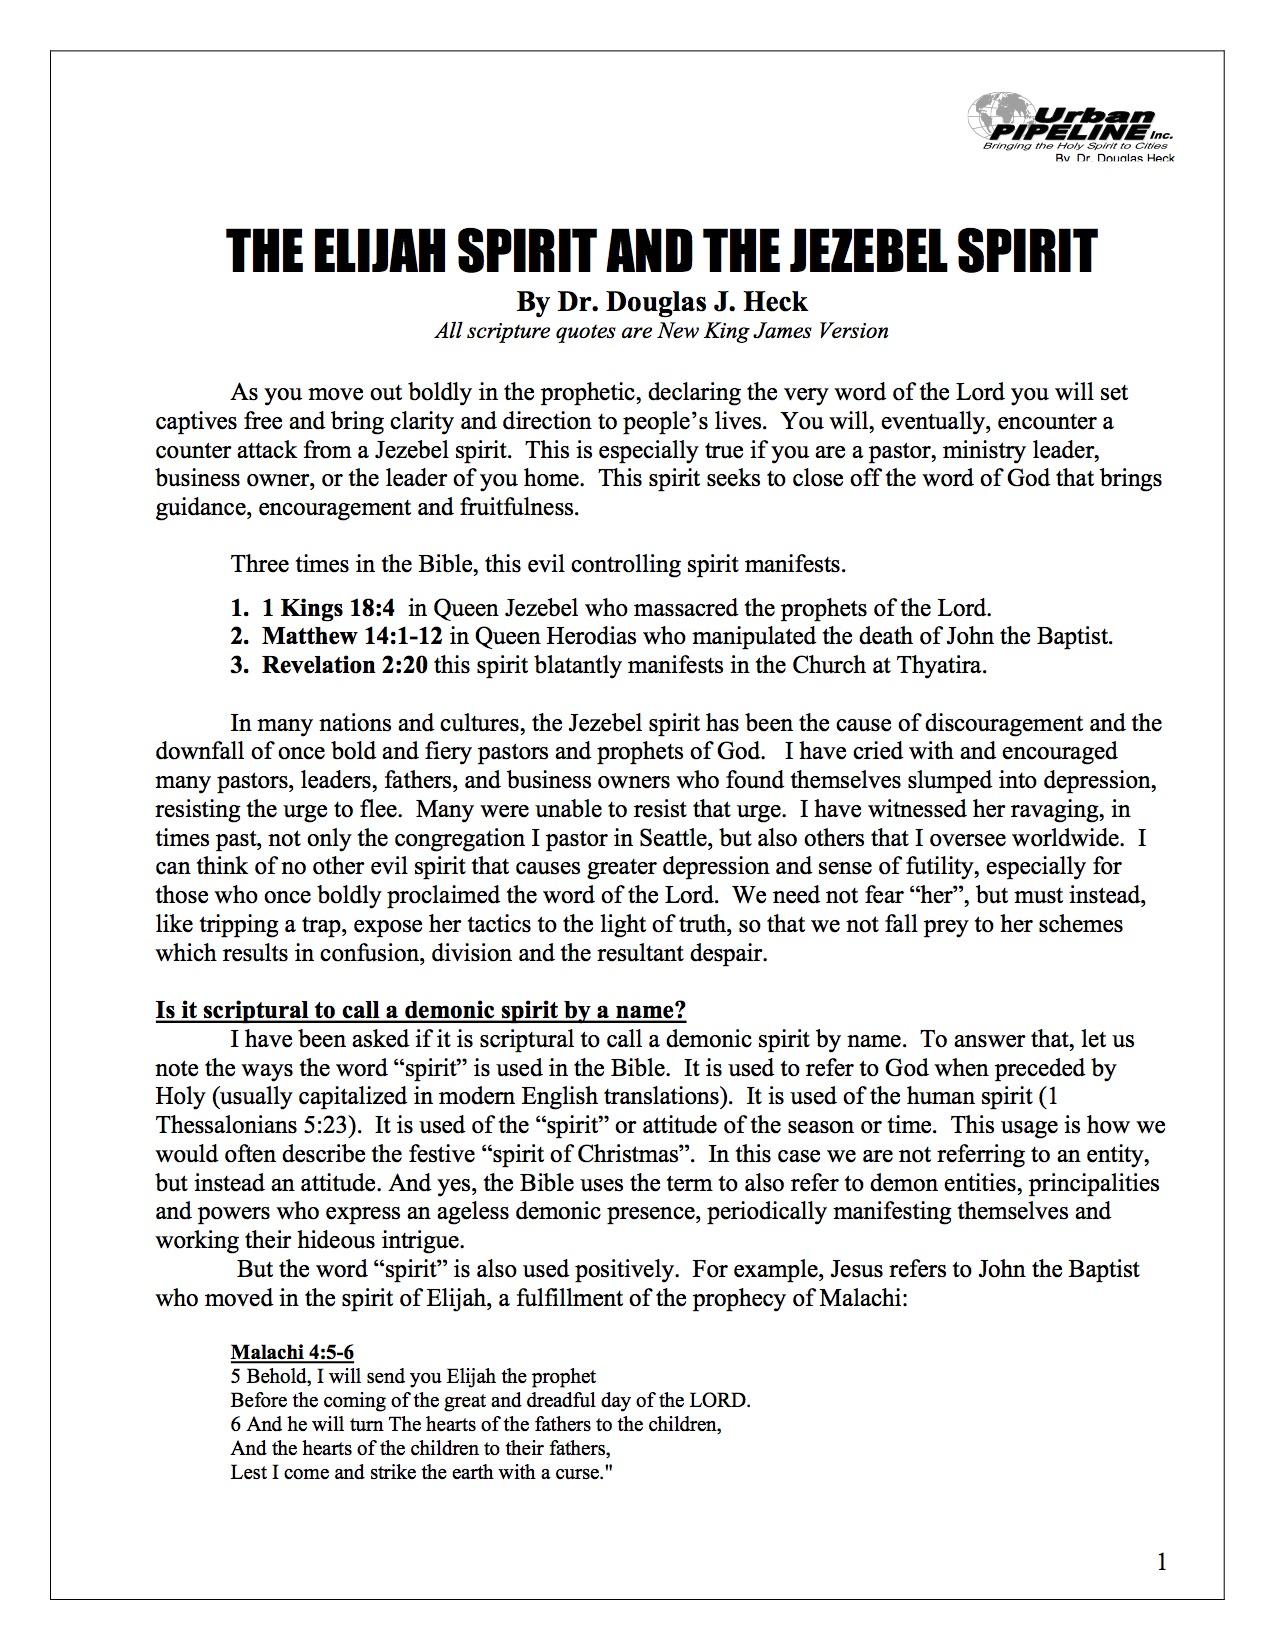 The Elijah Spirit and the Jezebel Spirit